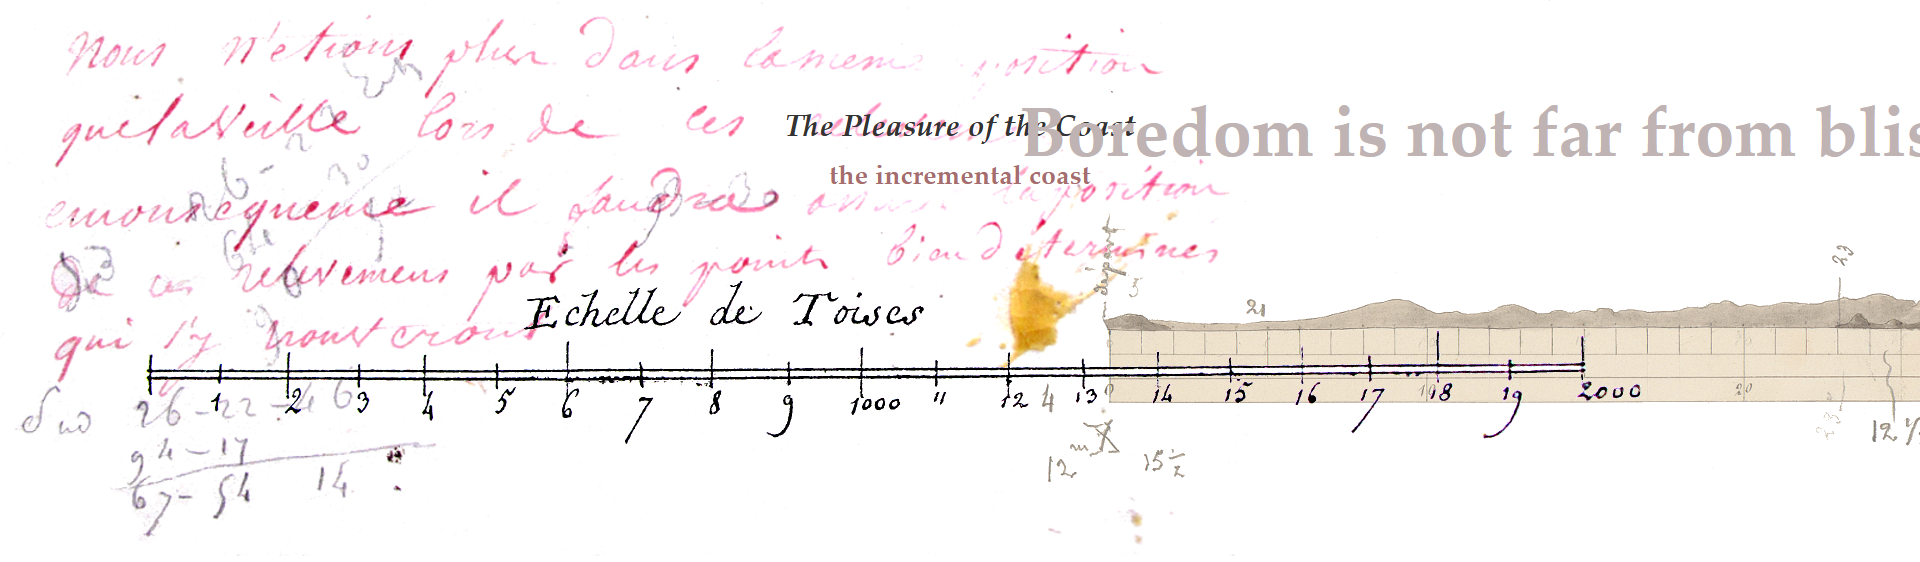 """the incremental coast"" in J. R. Carpenter's The Pleasure of the Coast"